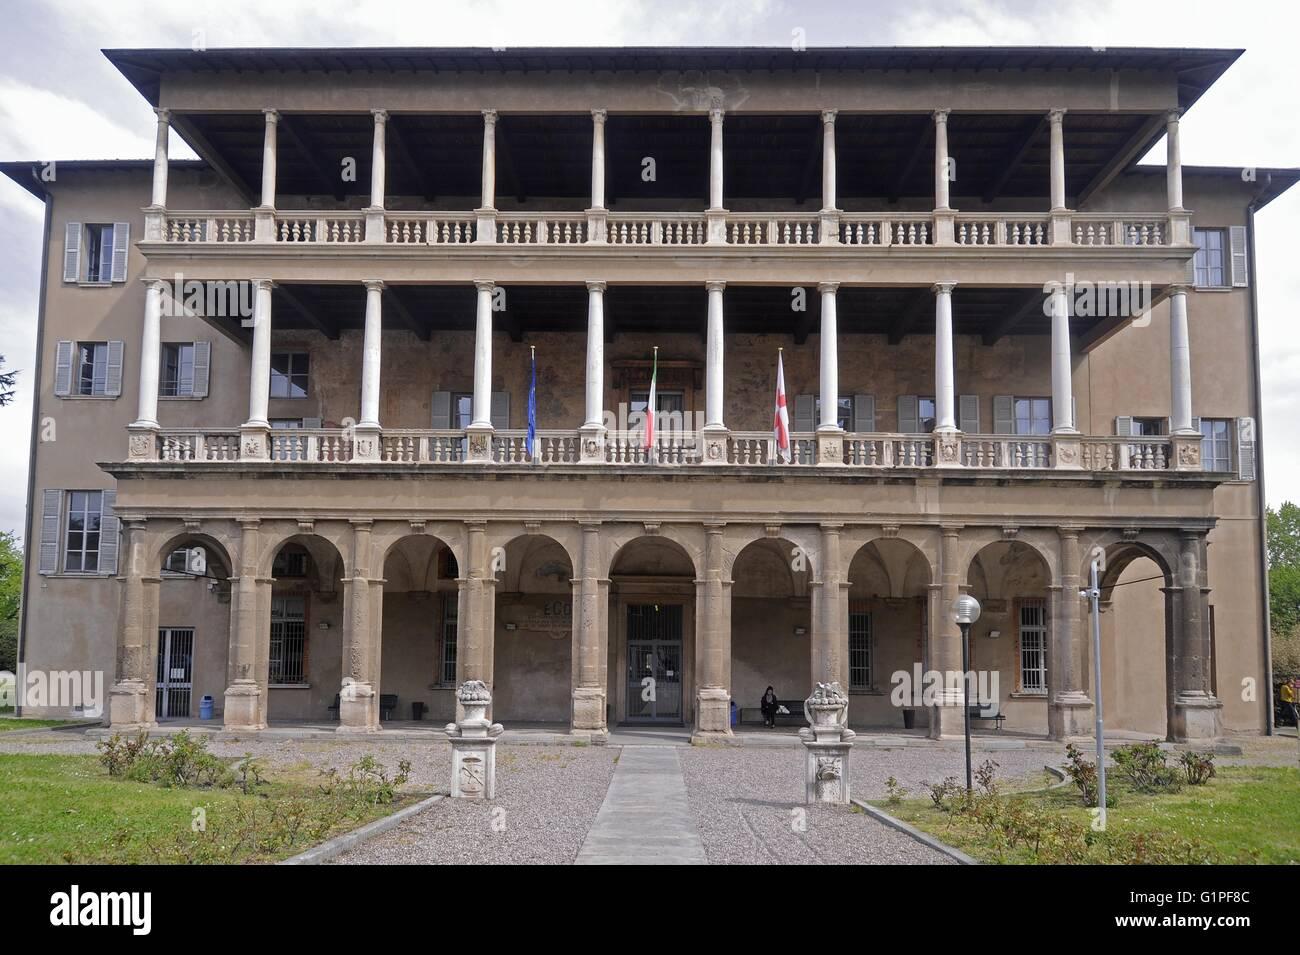 Civic Schools of Milan (Italy), Music School Claudio Abbado. Villa Simonetta, patrician Renaissance building built - Stock Image